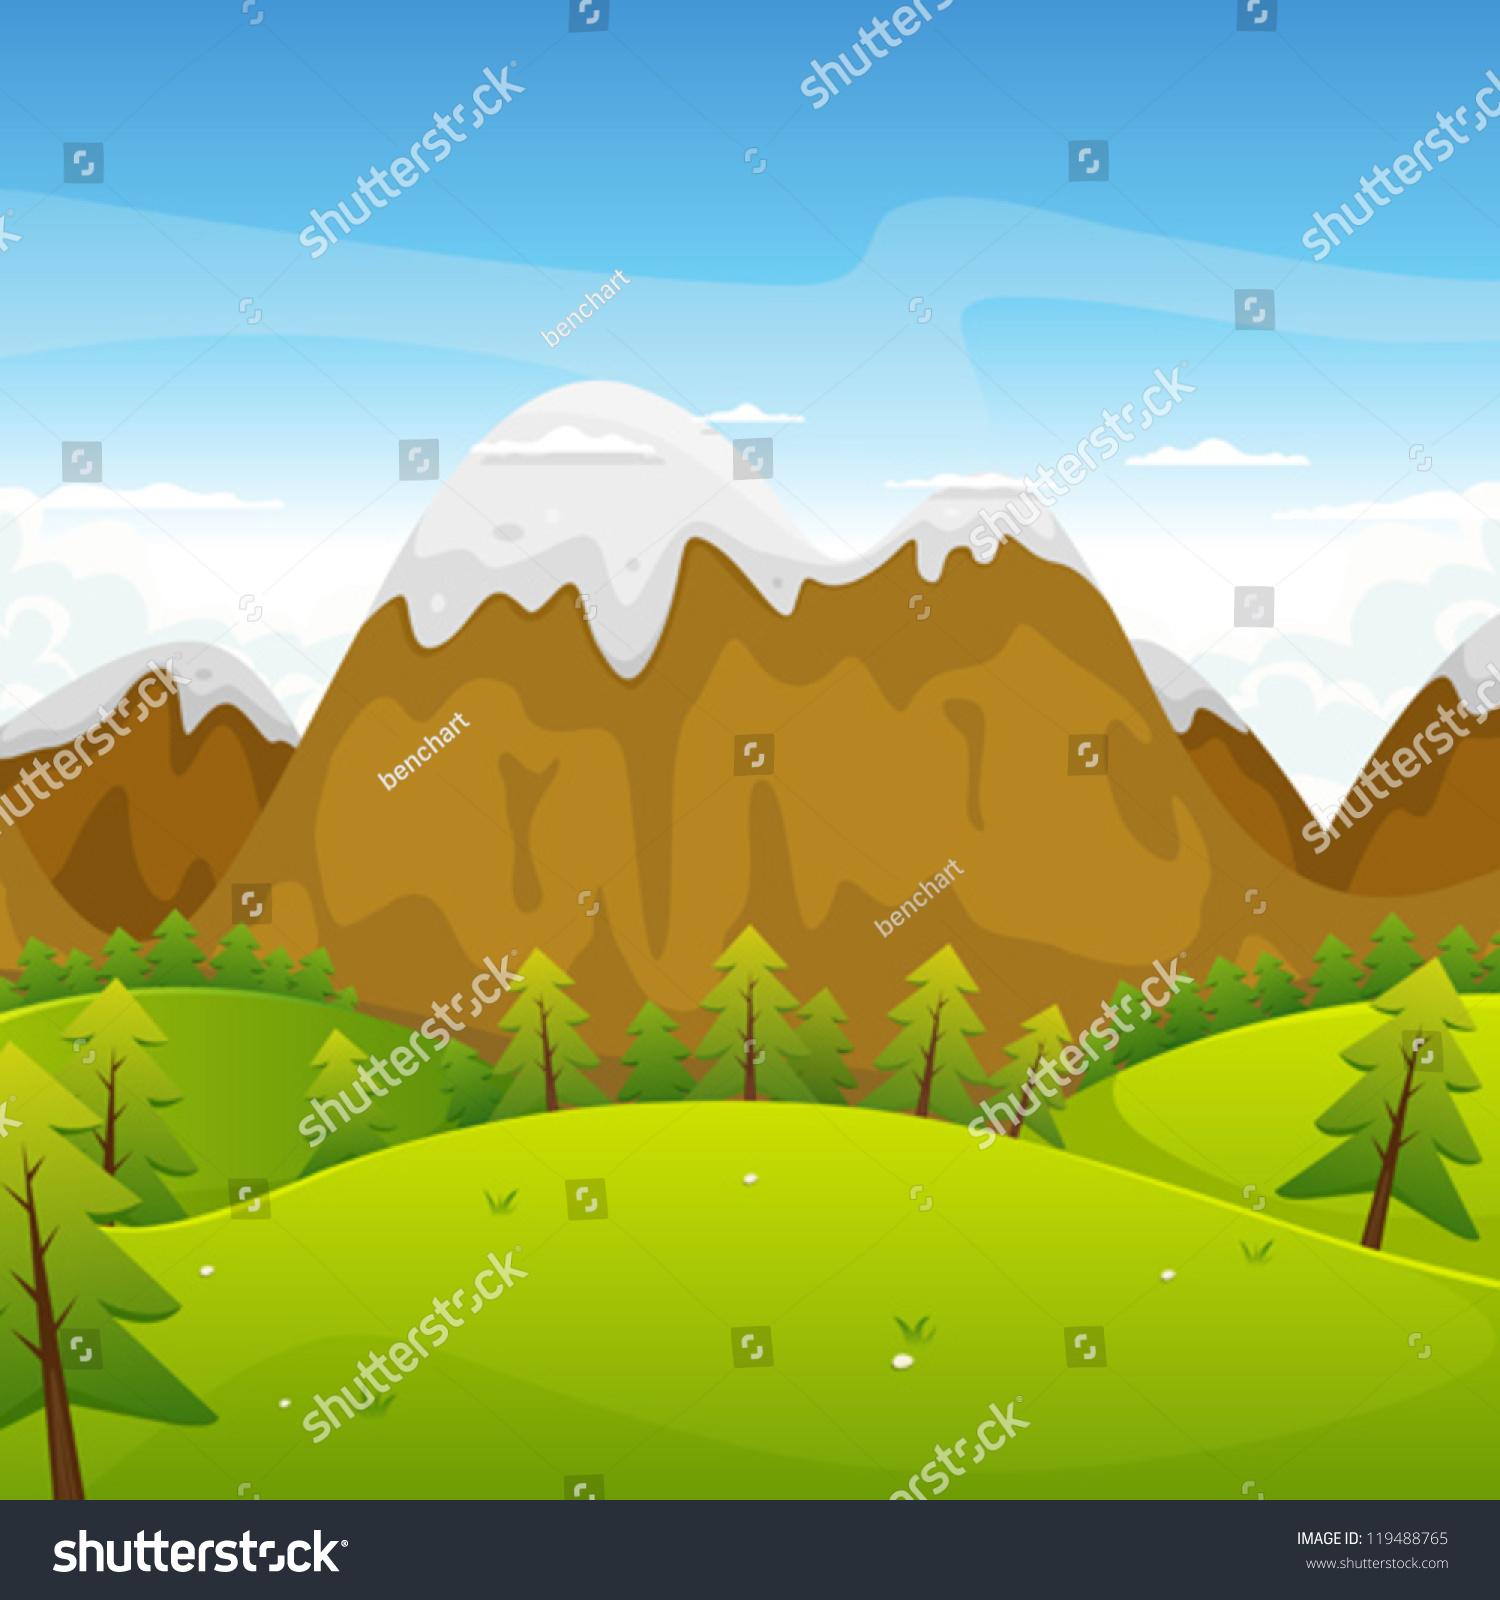 Landscape Illustration Vector Free: Cartoon Mountains Landscape Illustration Cartoon Summer